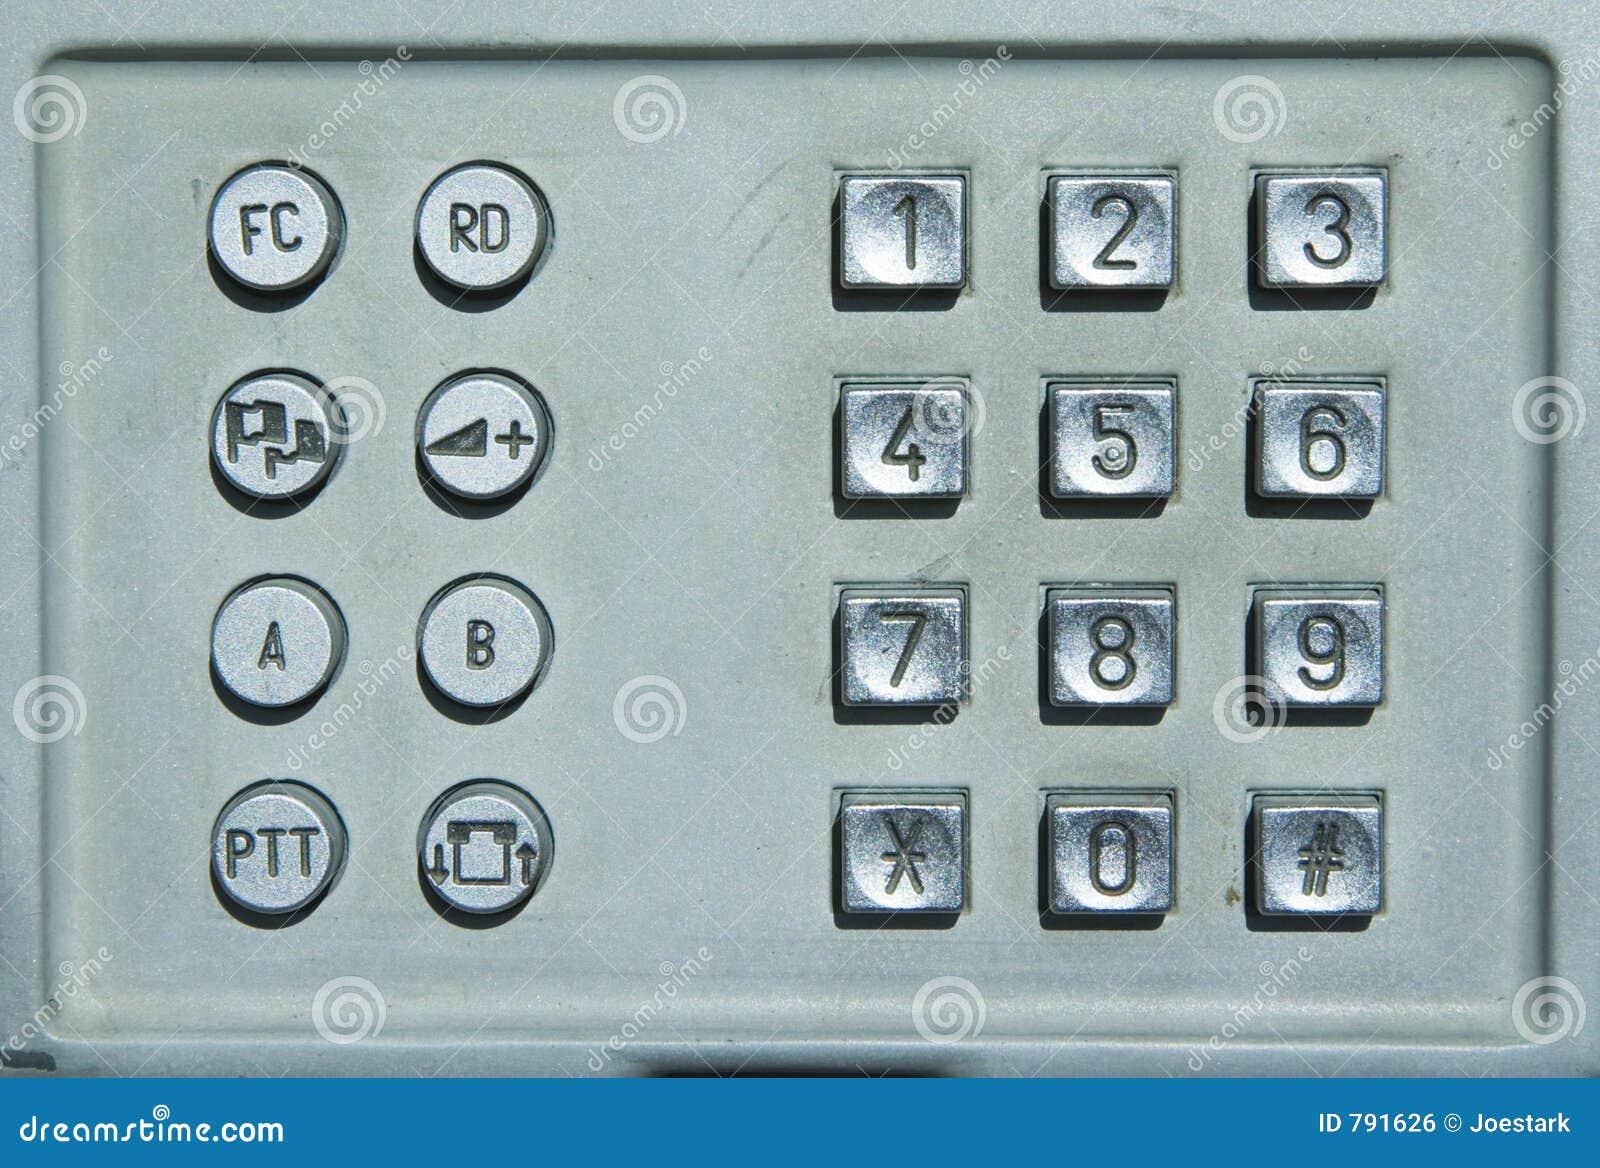 Openbaar telefoontoetsenbord